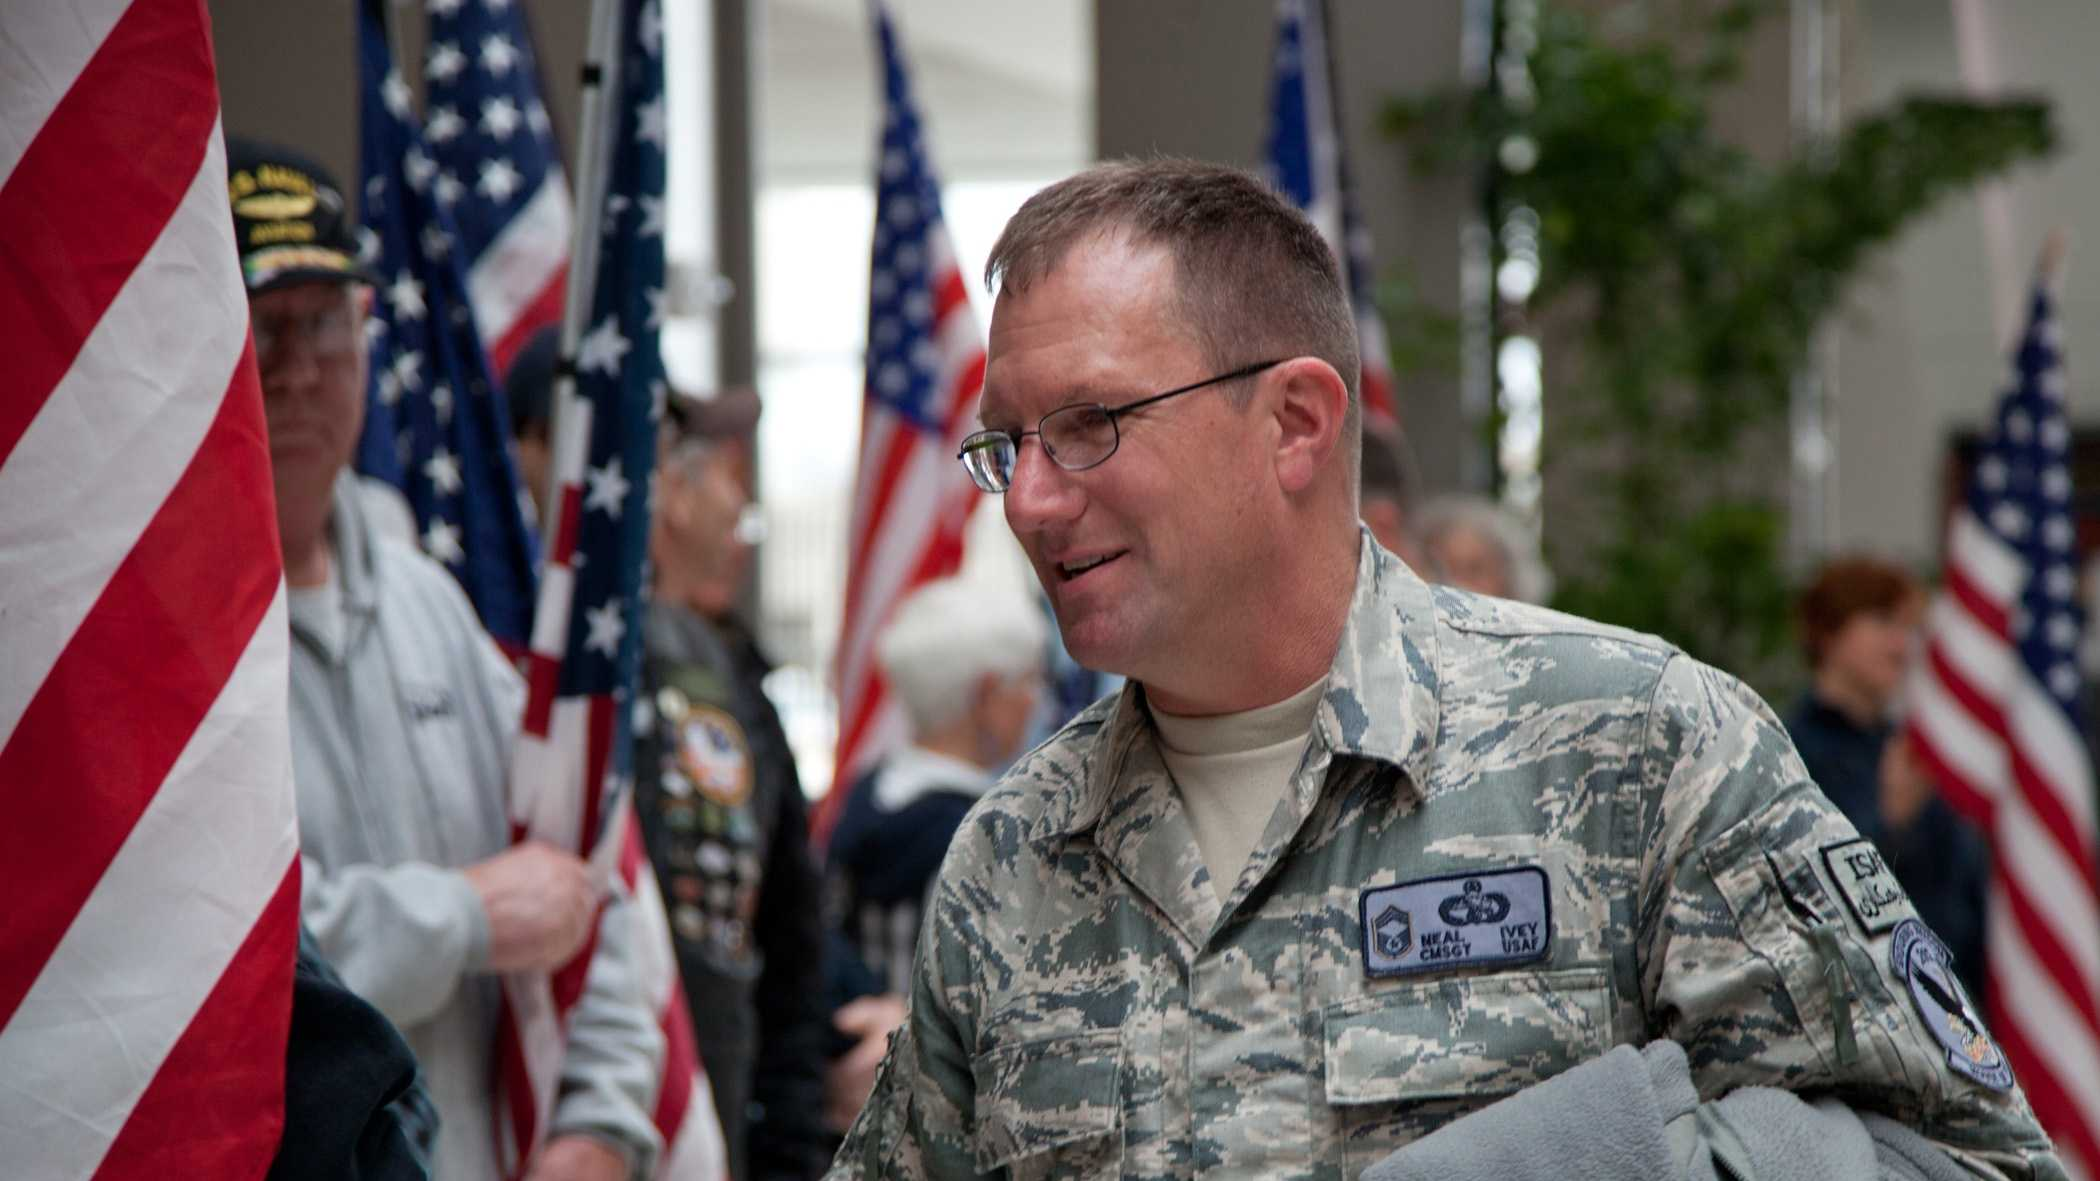 Master Sgt. Robert Ivey